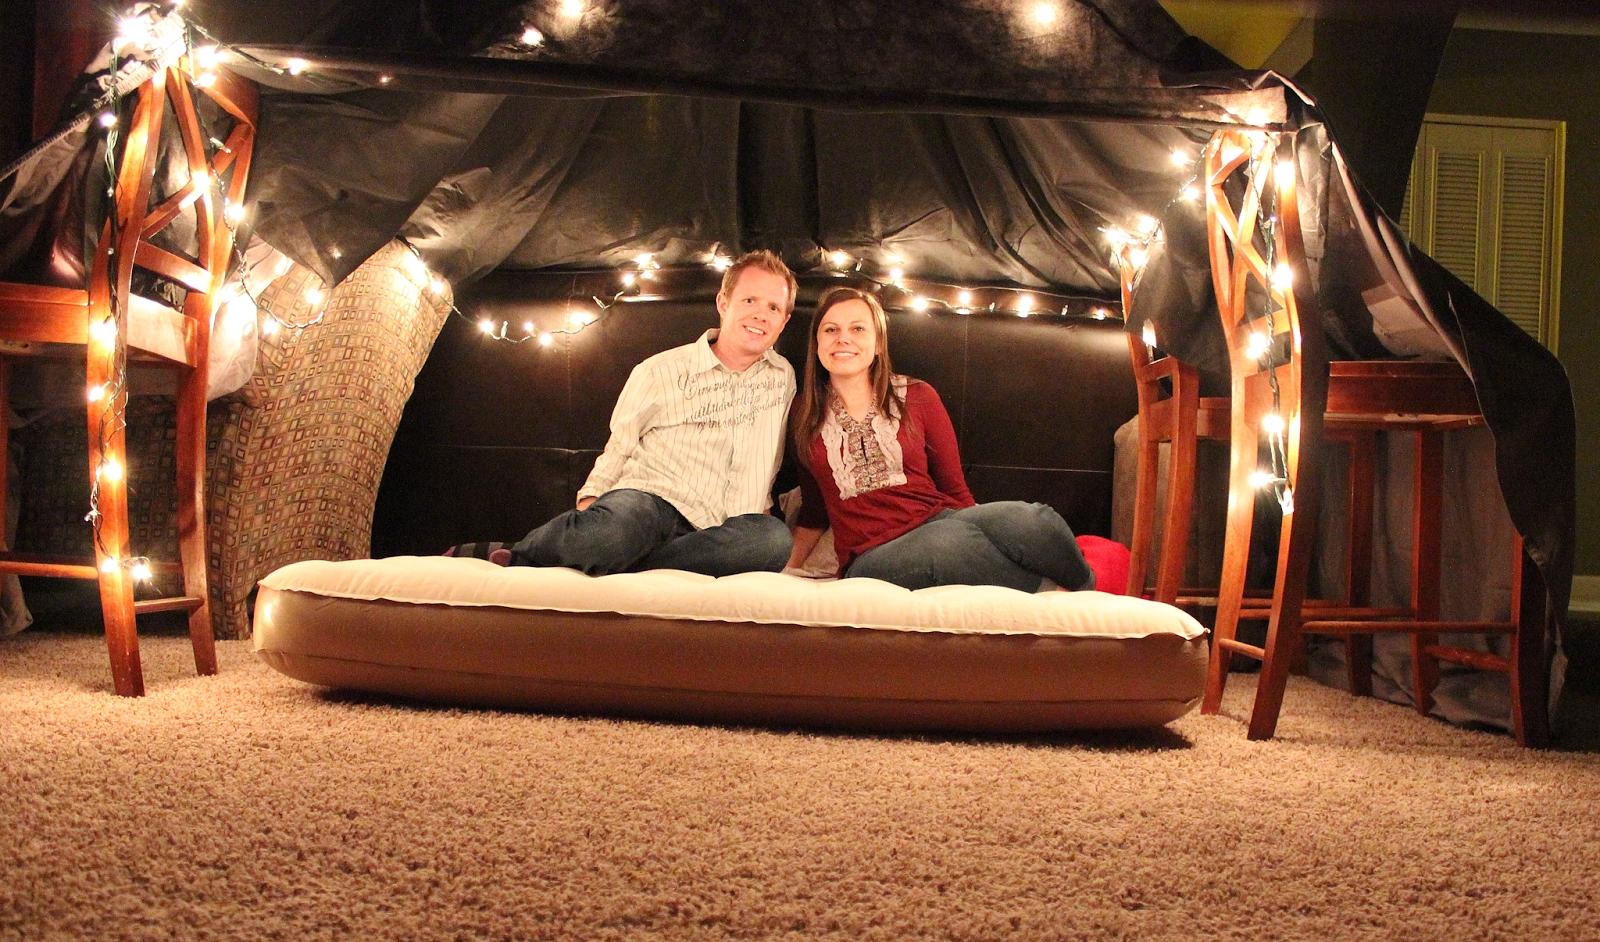 10 Fabulous Romantic Date Ideas At Home romantic date ideas at home cheap ideas for your romantic date